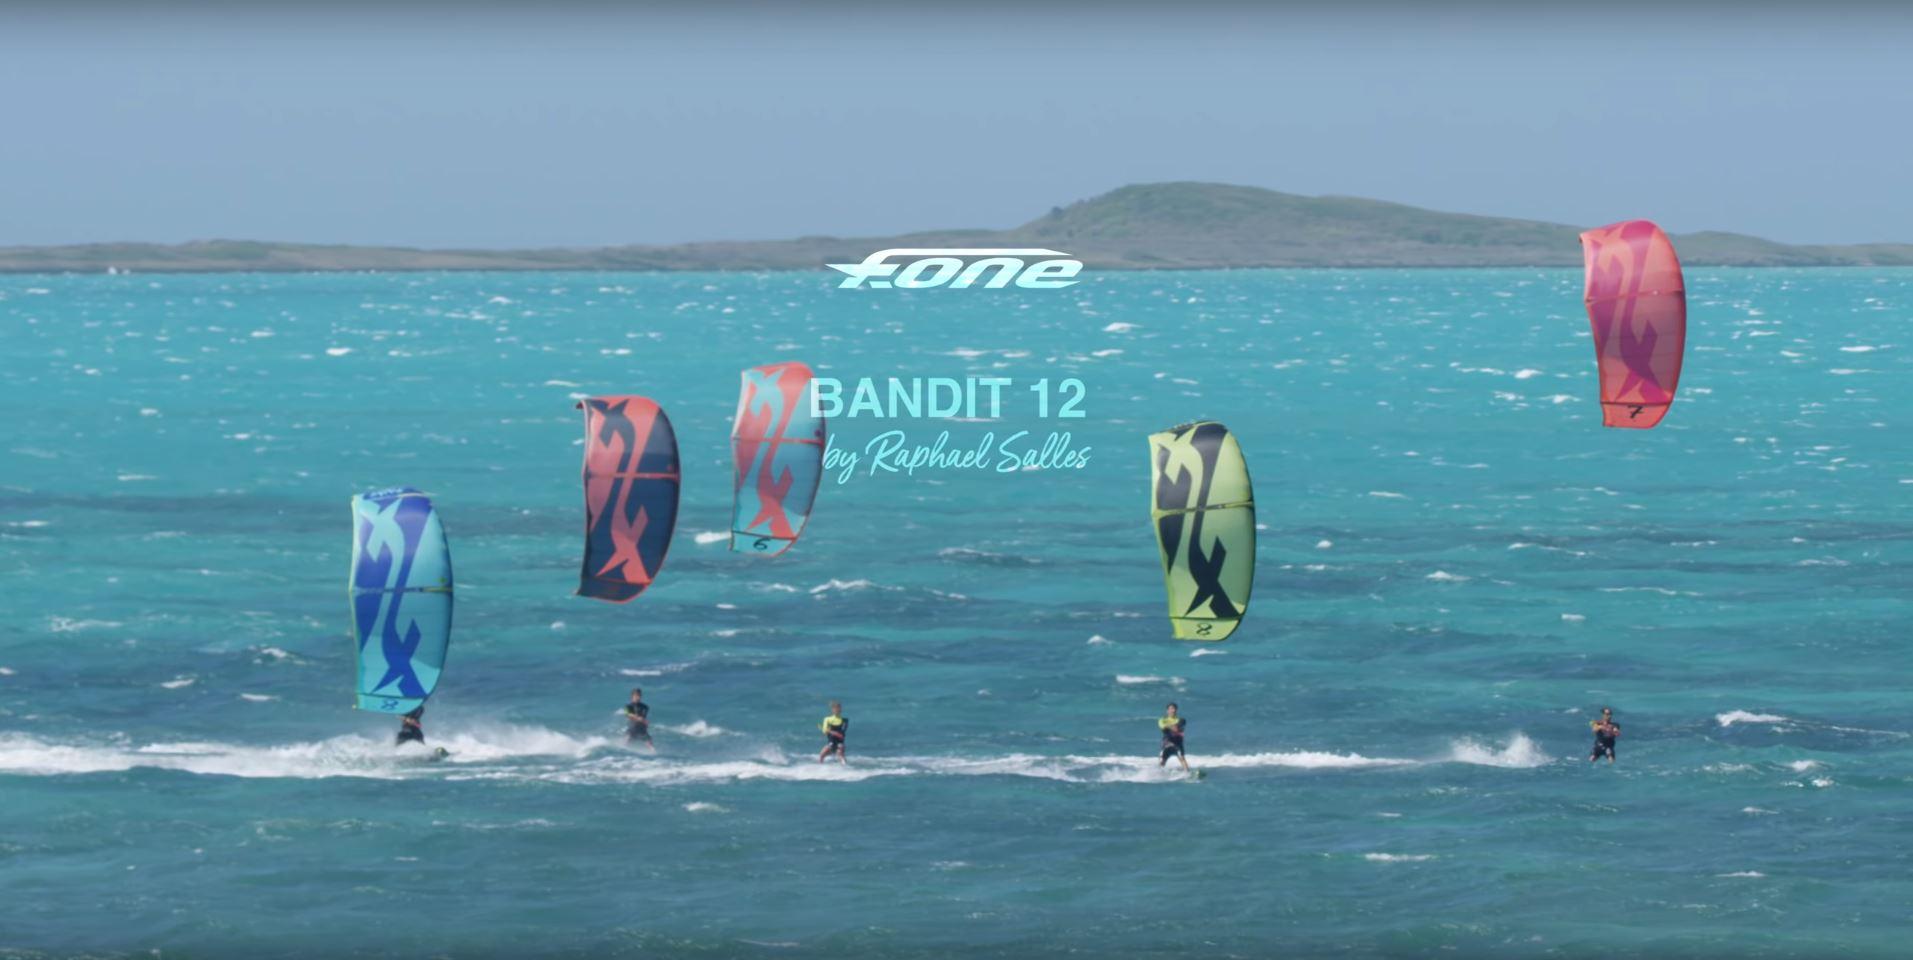 BANDIT XII 2019 / FONE